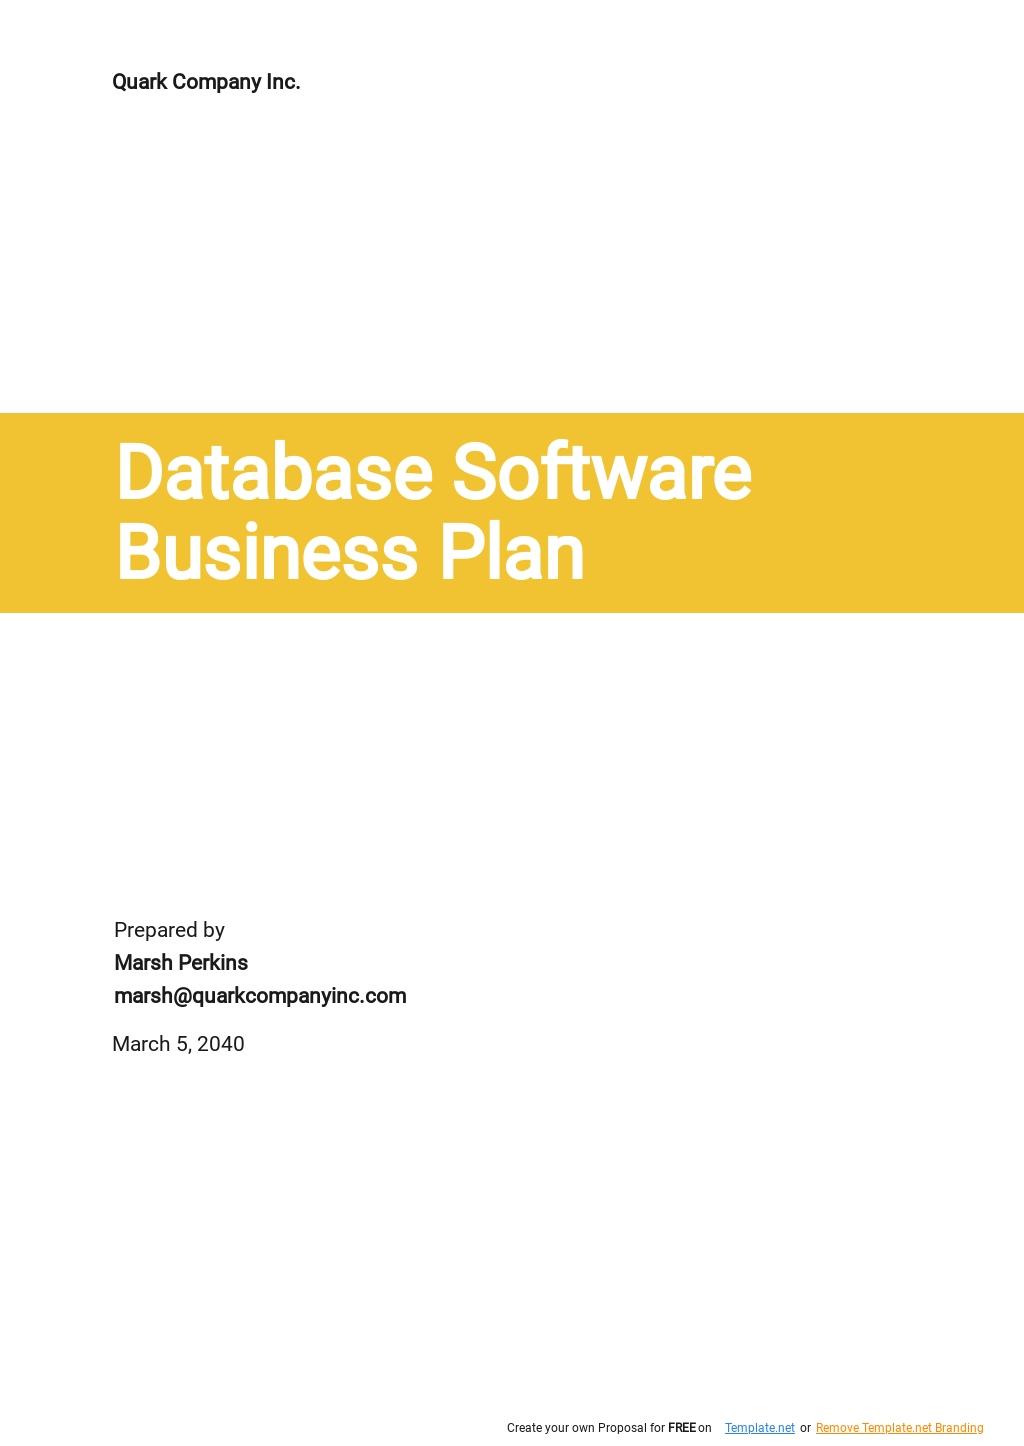 Database Software Business Plan Template.jpe